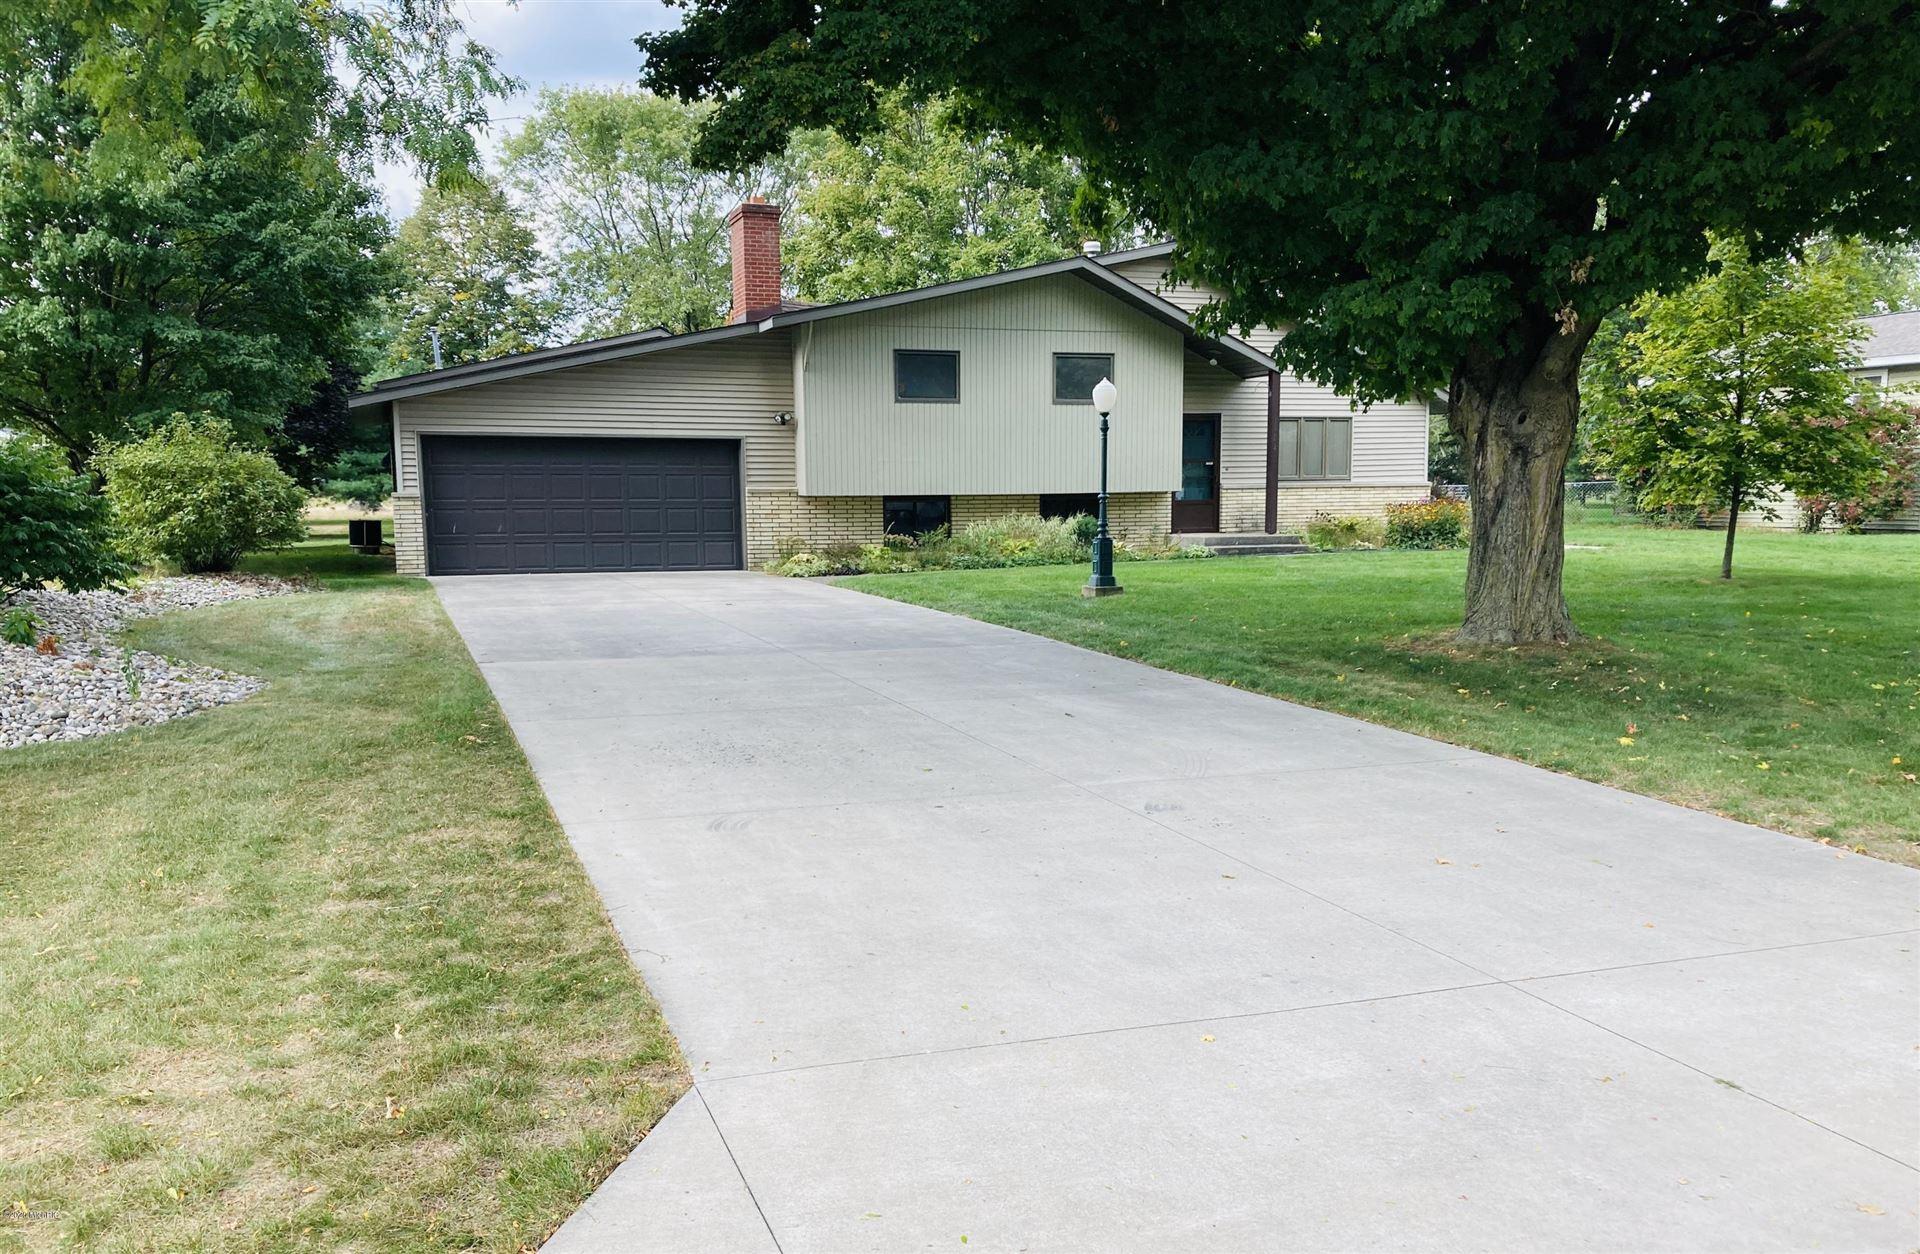 18045 Shamrock Boulevard, Big Rapids, MI 49307 - MLS#: 20040696